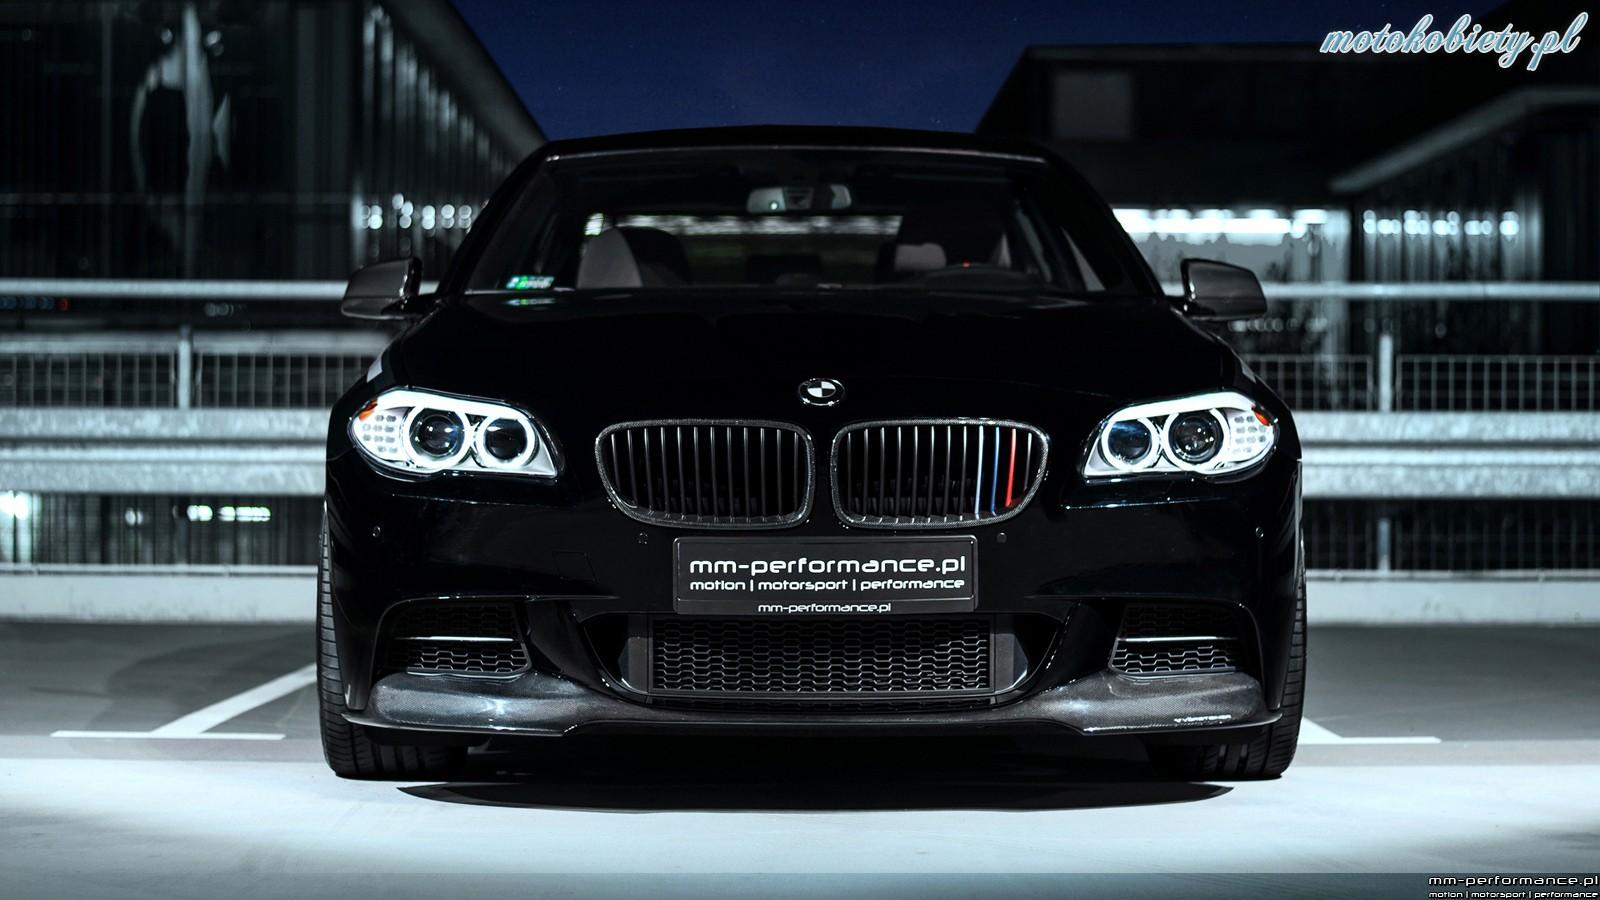 BMW M550d MM-Performance